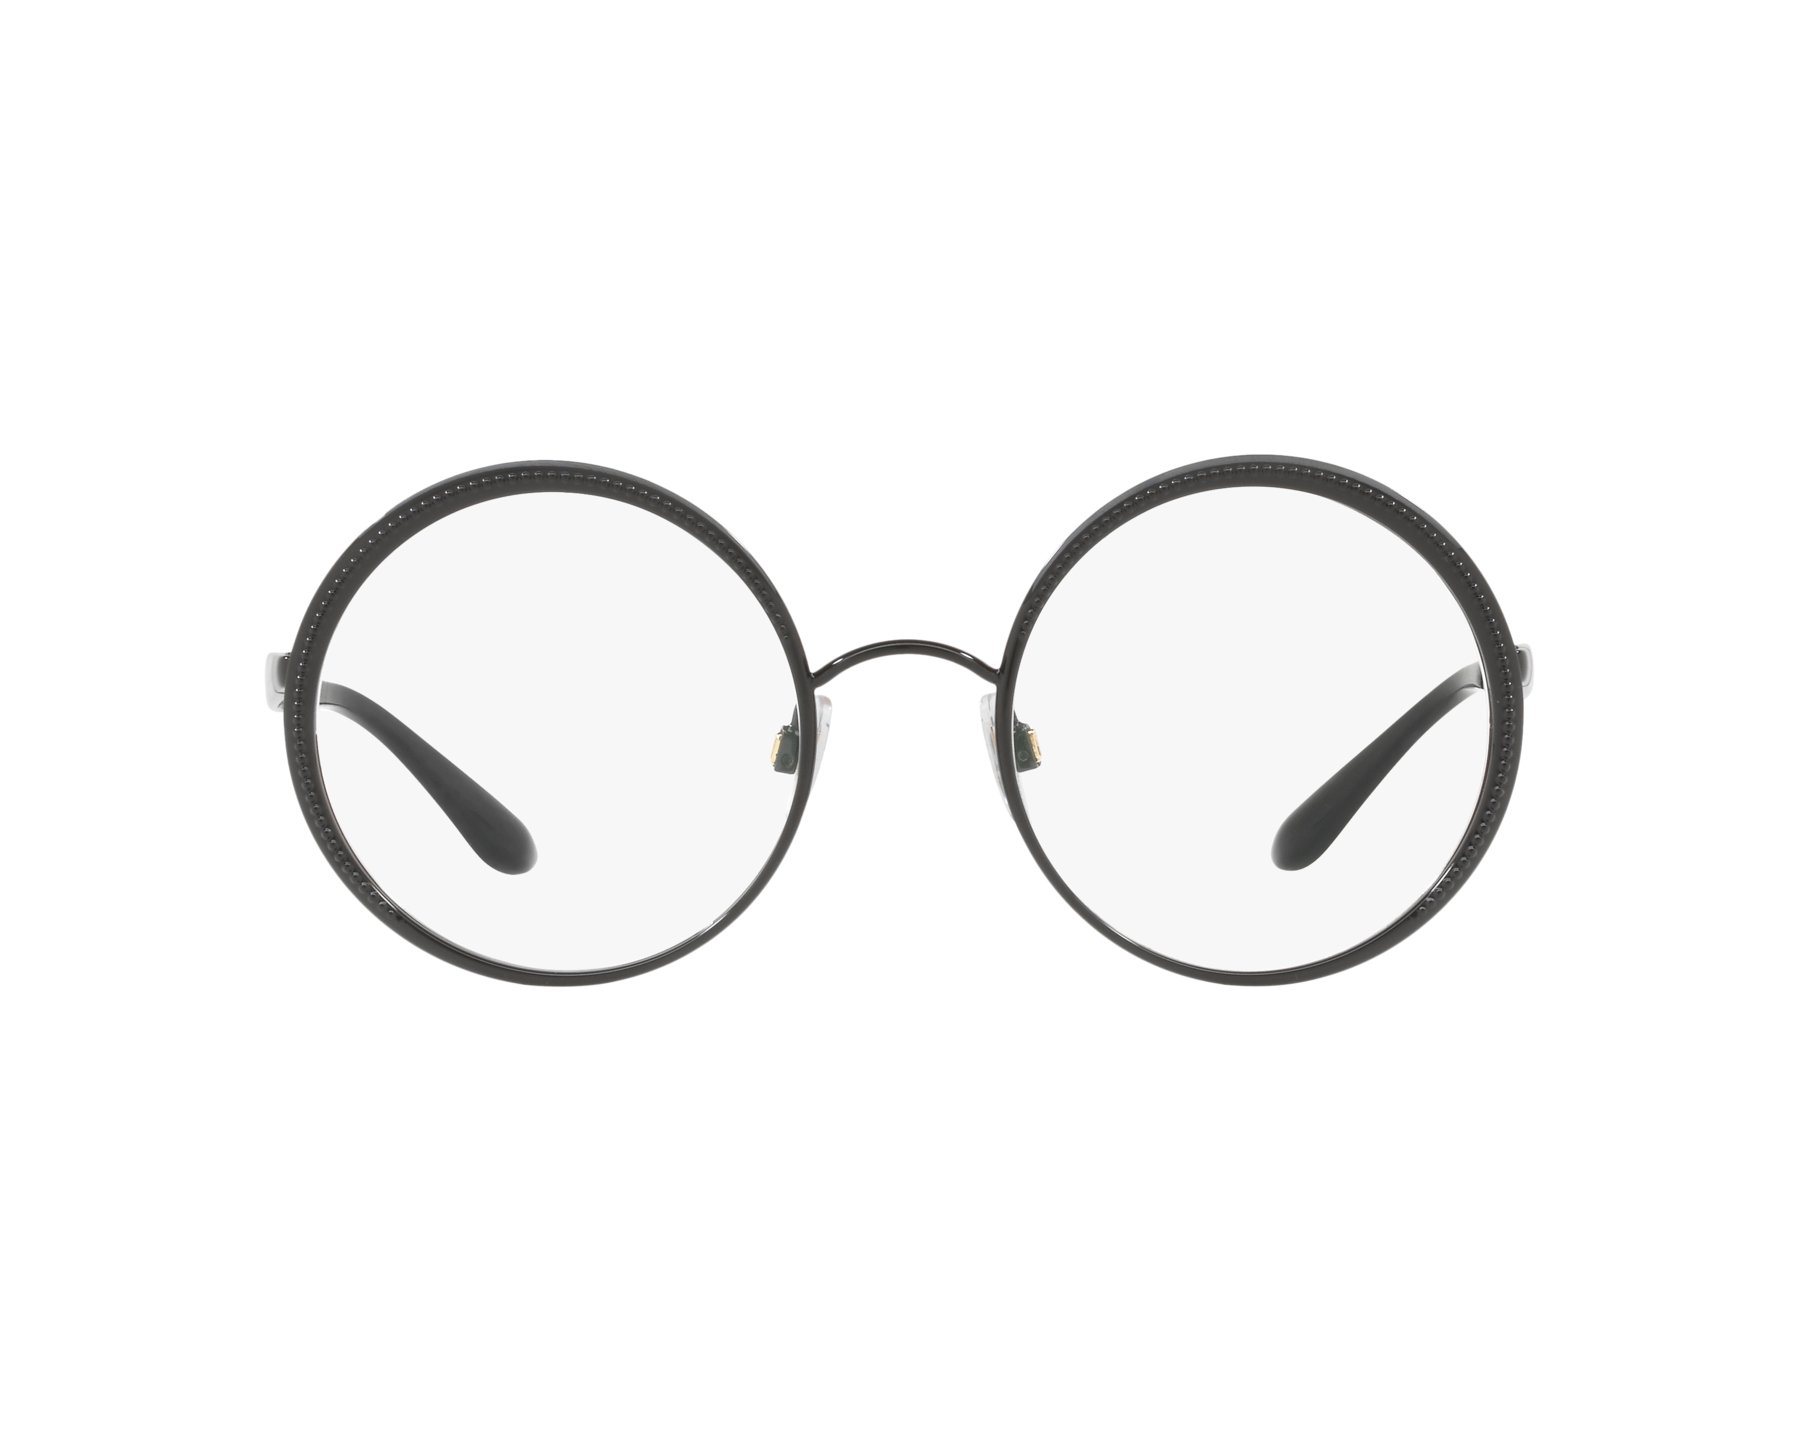 eyeglasses Dolce & Gabbana DG-1297 01 52-21 Black 360 degree view 1